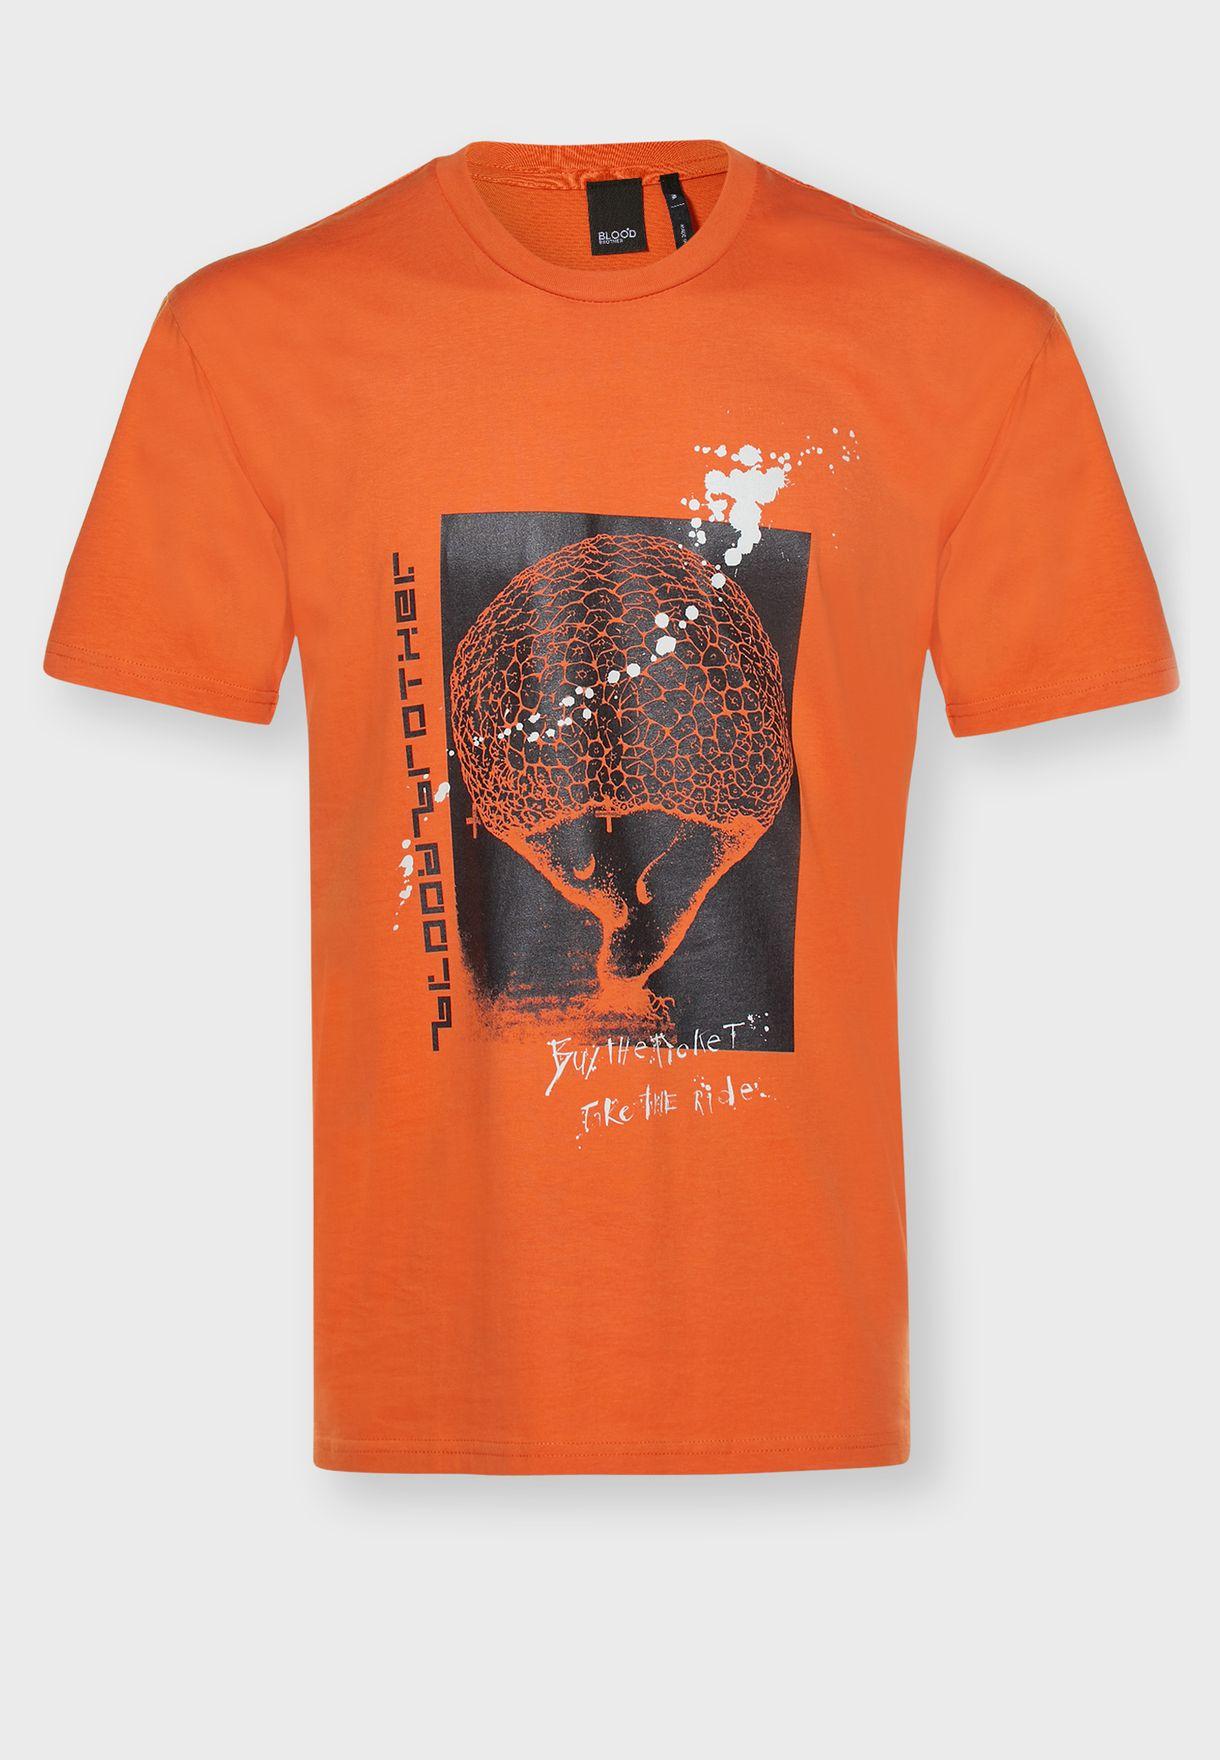 Take The Ride Printed T-Shirt